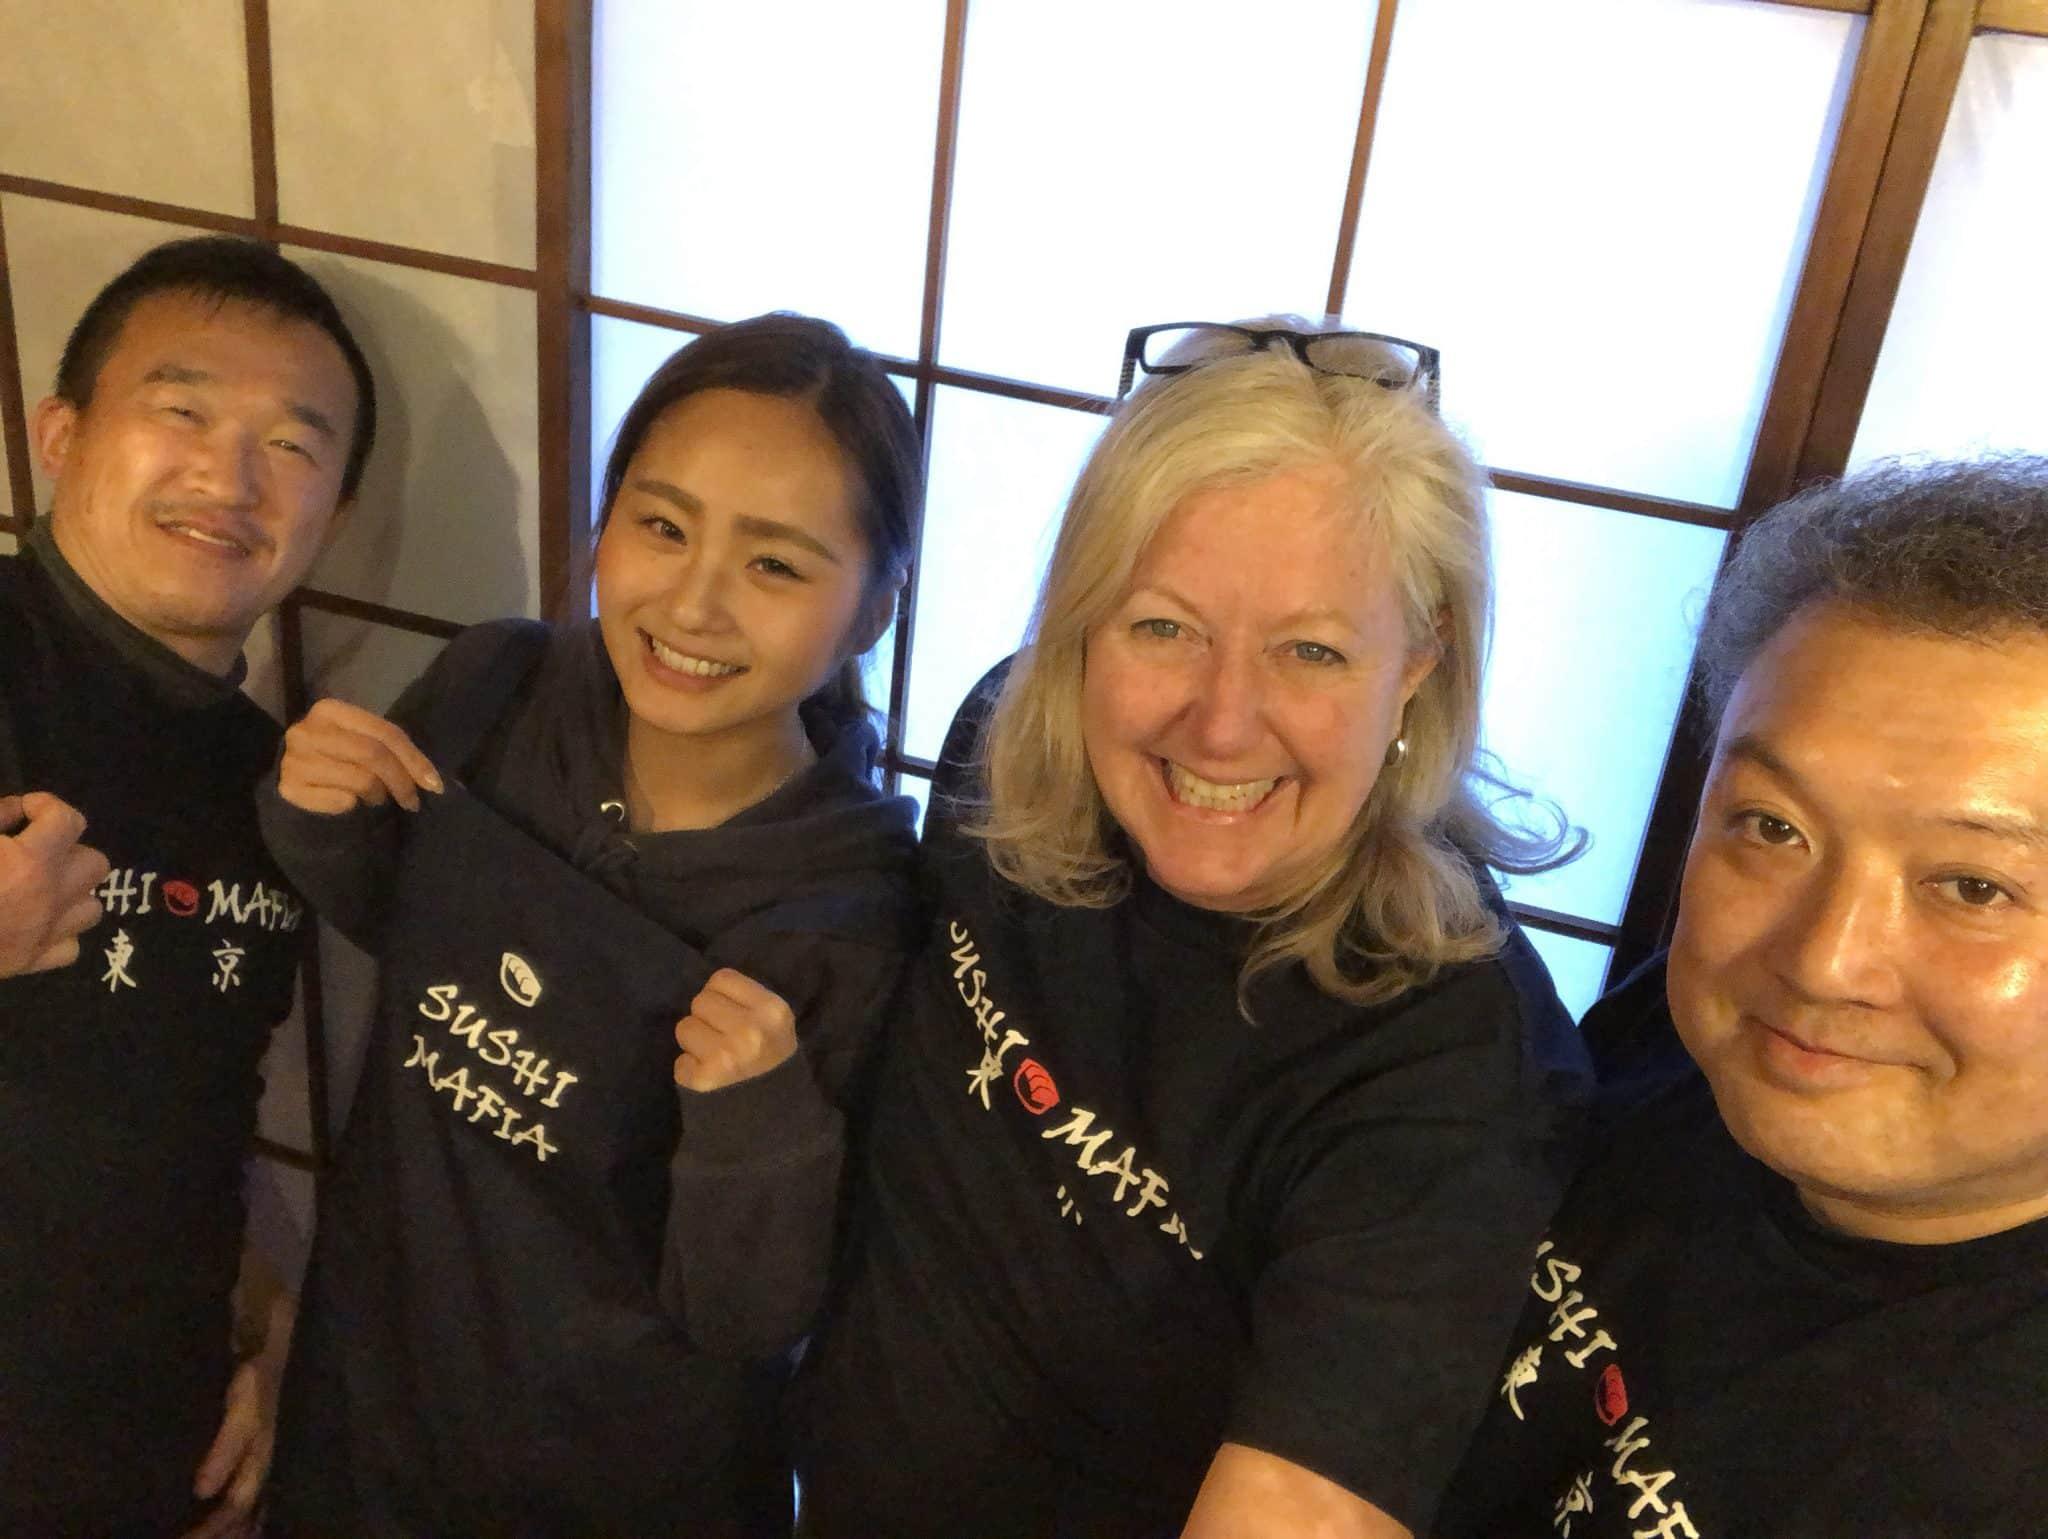 japan-tokyo-sushi-_mafia-team-with-melnaie-ceo-rare-finds-travel